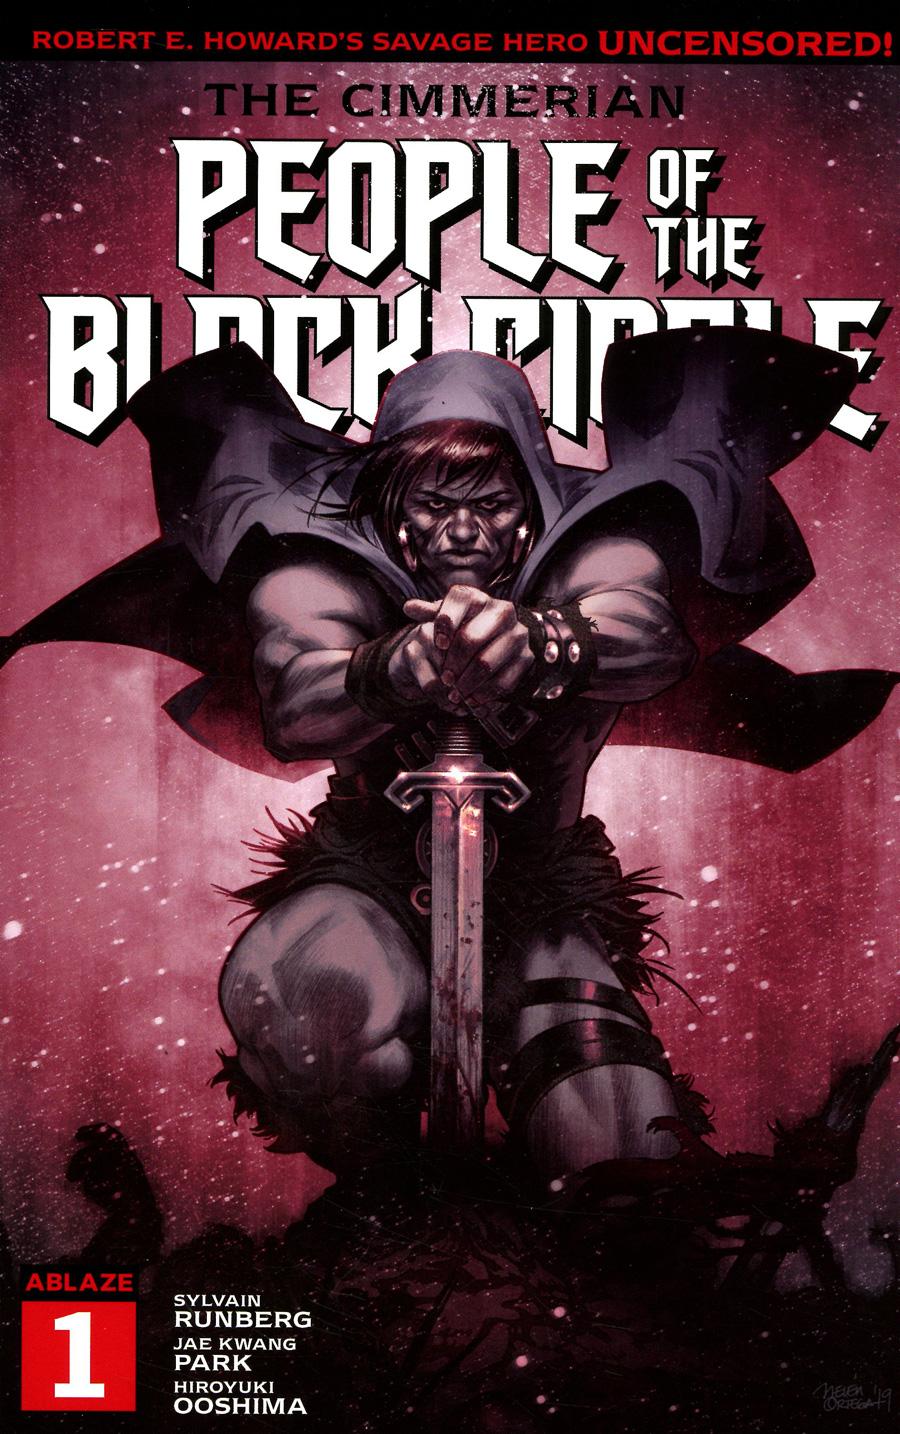 Cimmerian People Of The Black Circle #1 Cover D Variant Belen Ortega Cover